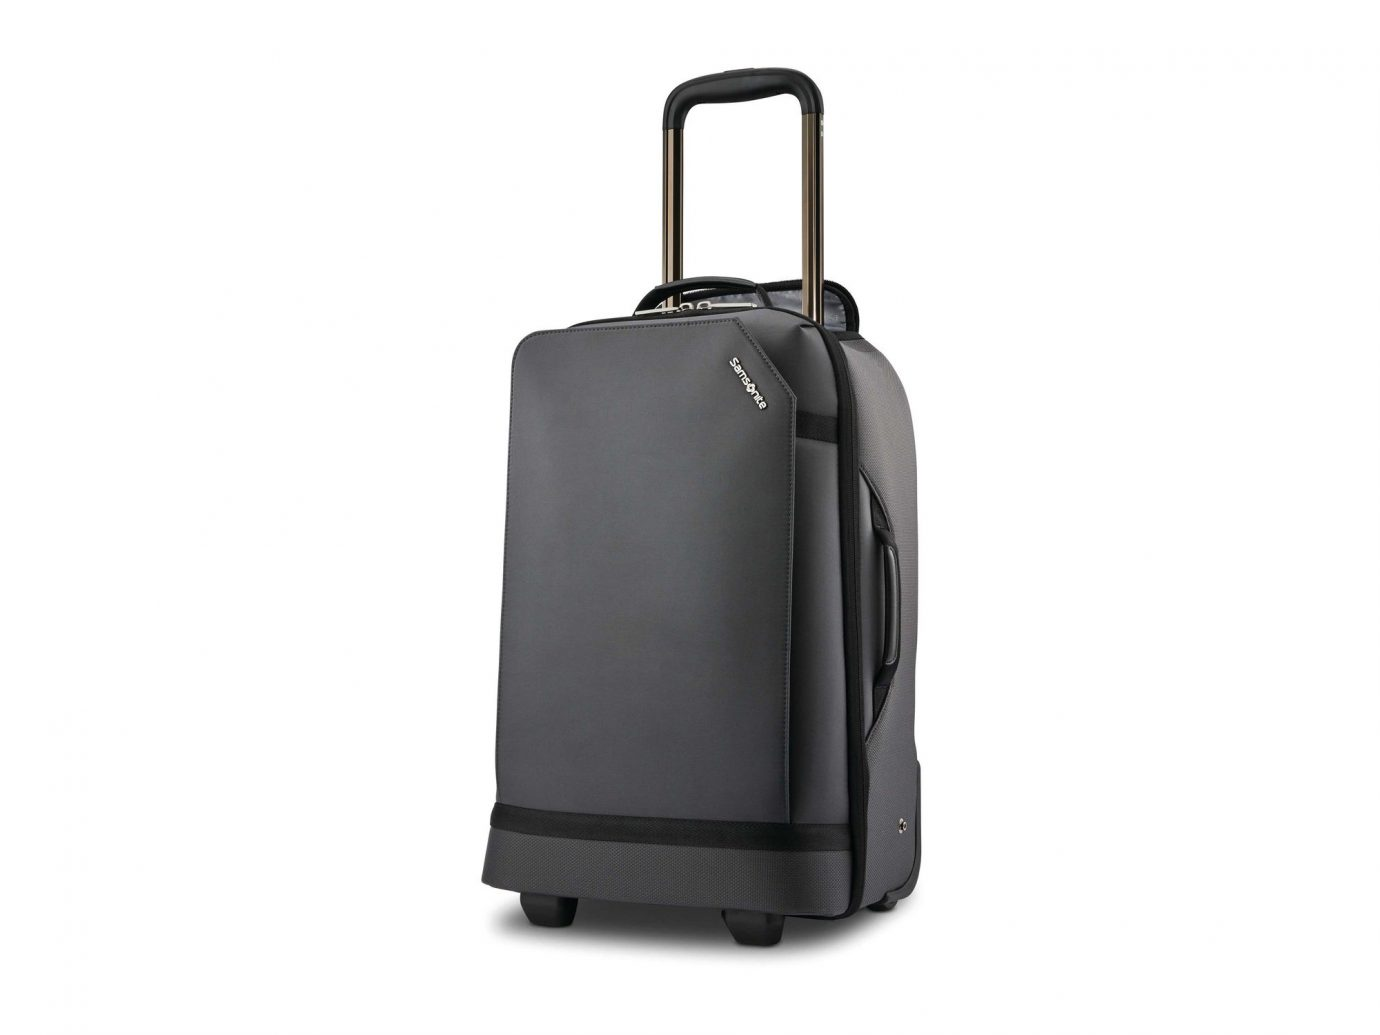 Samsonite Encompass Convertible Wheeled Backpack